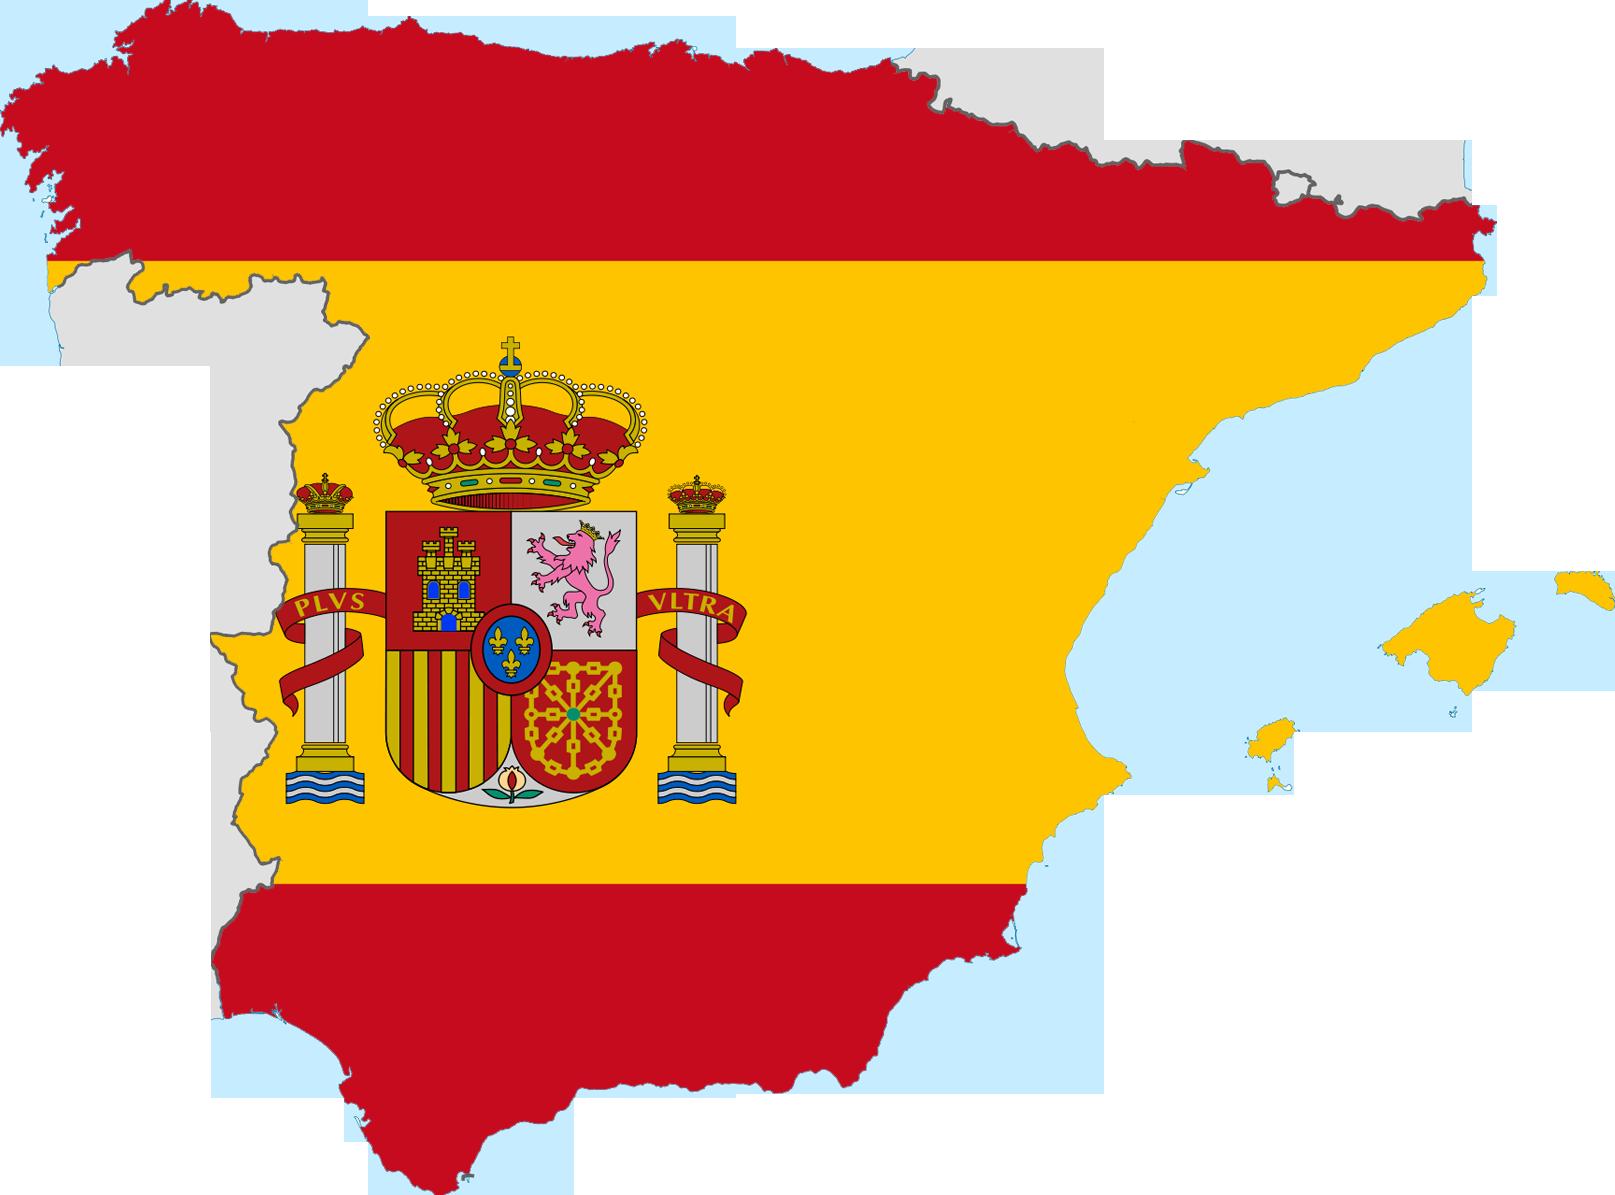 A New Islamic Occupation of Iberian Peninsula?